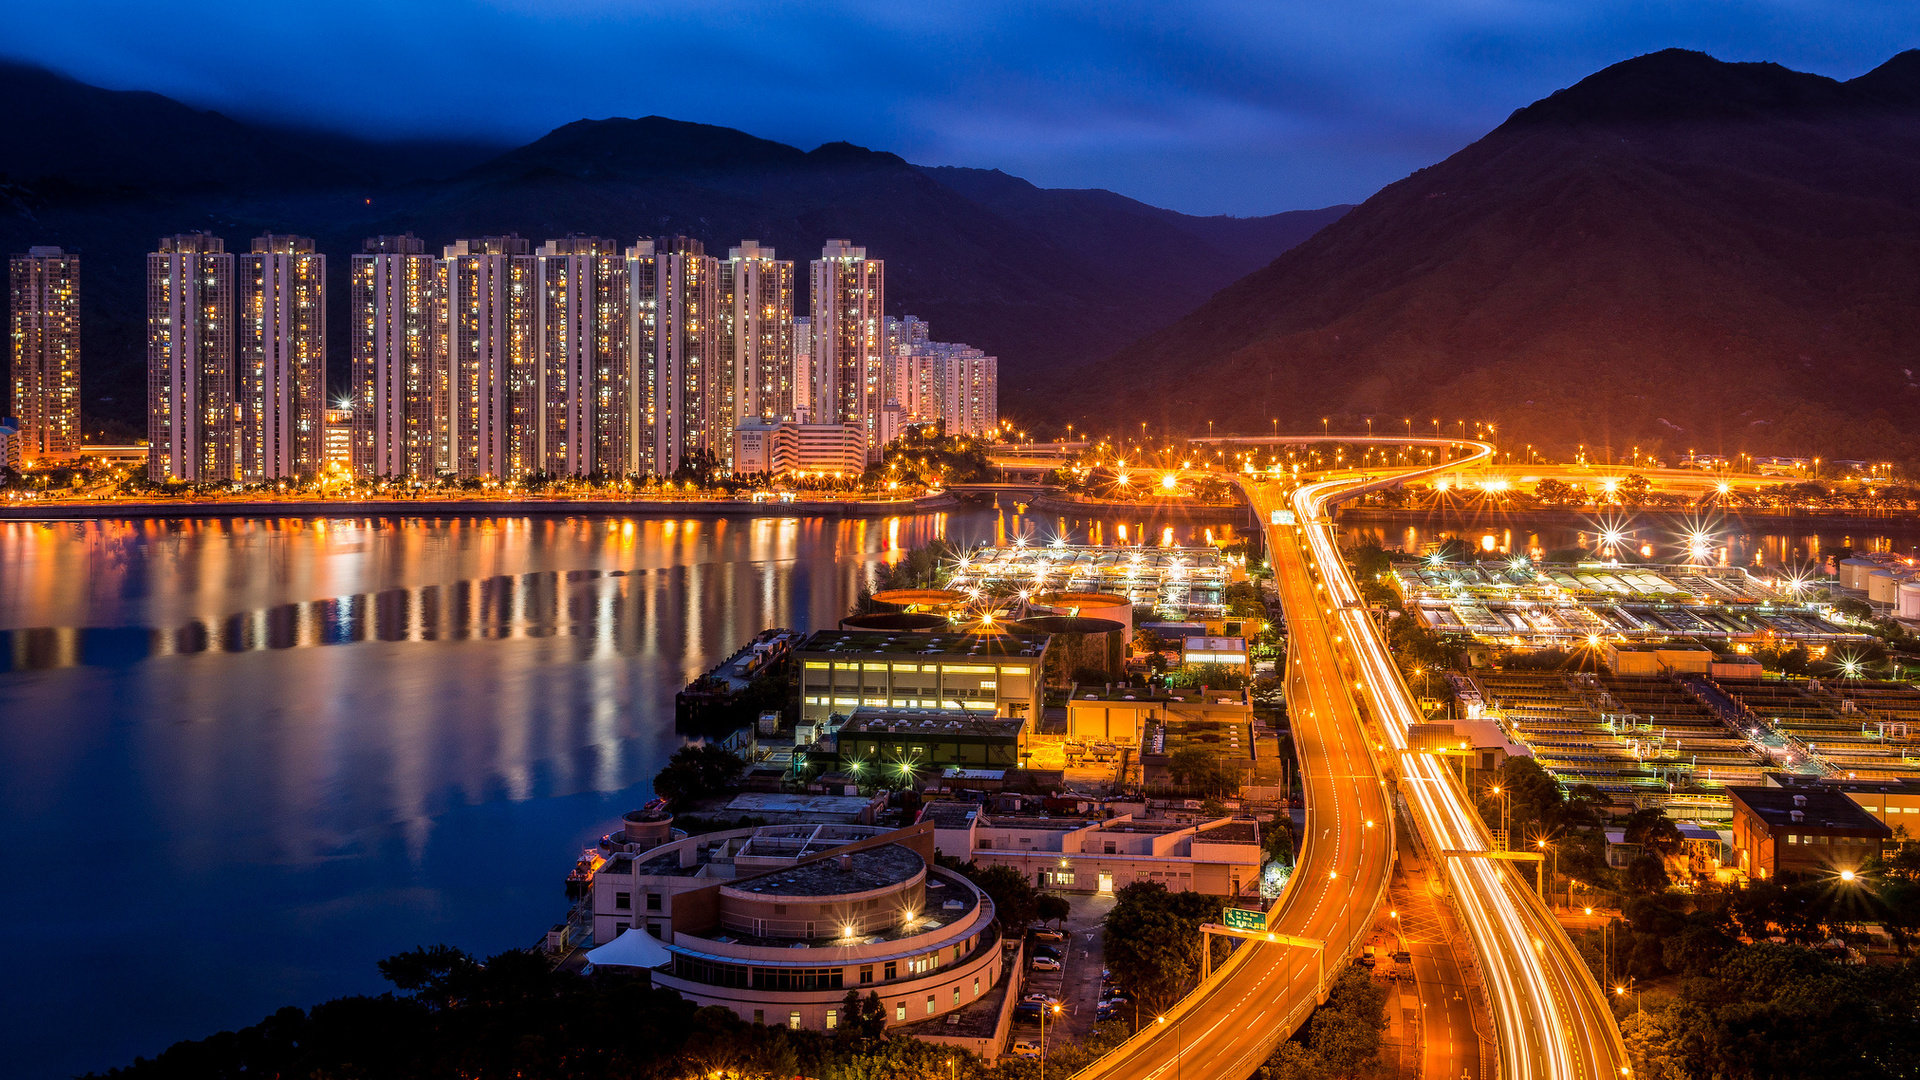 Hong Kong Wallpapers 1920x1080 Full HD (1080p) Desktop